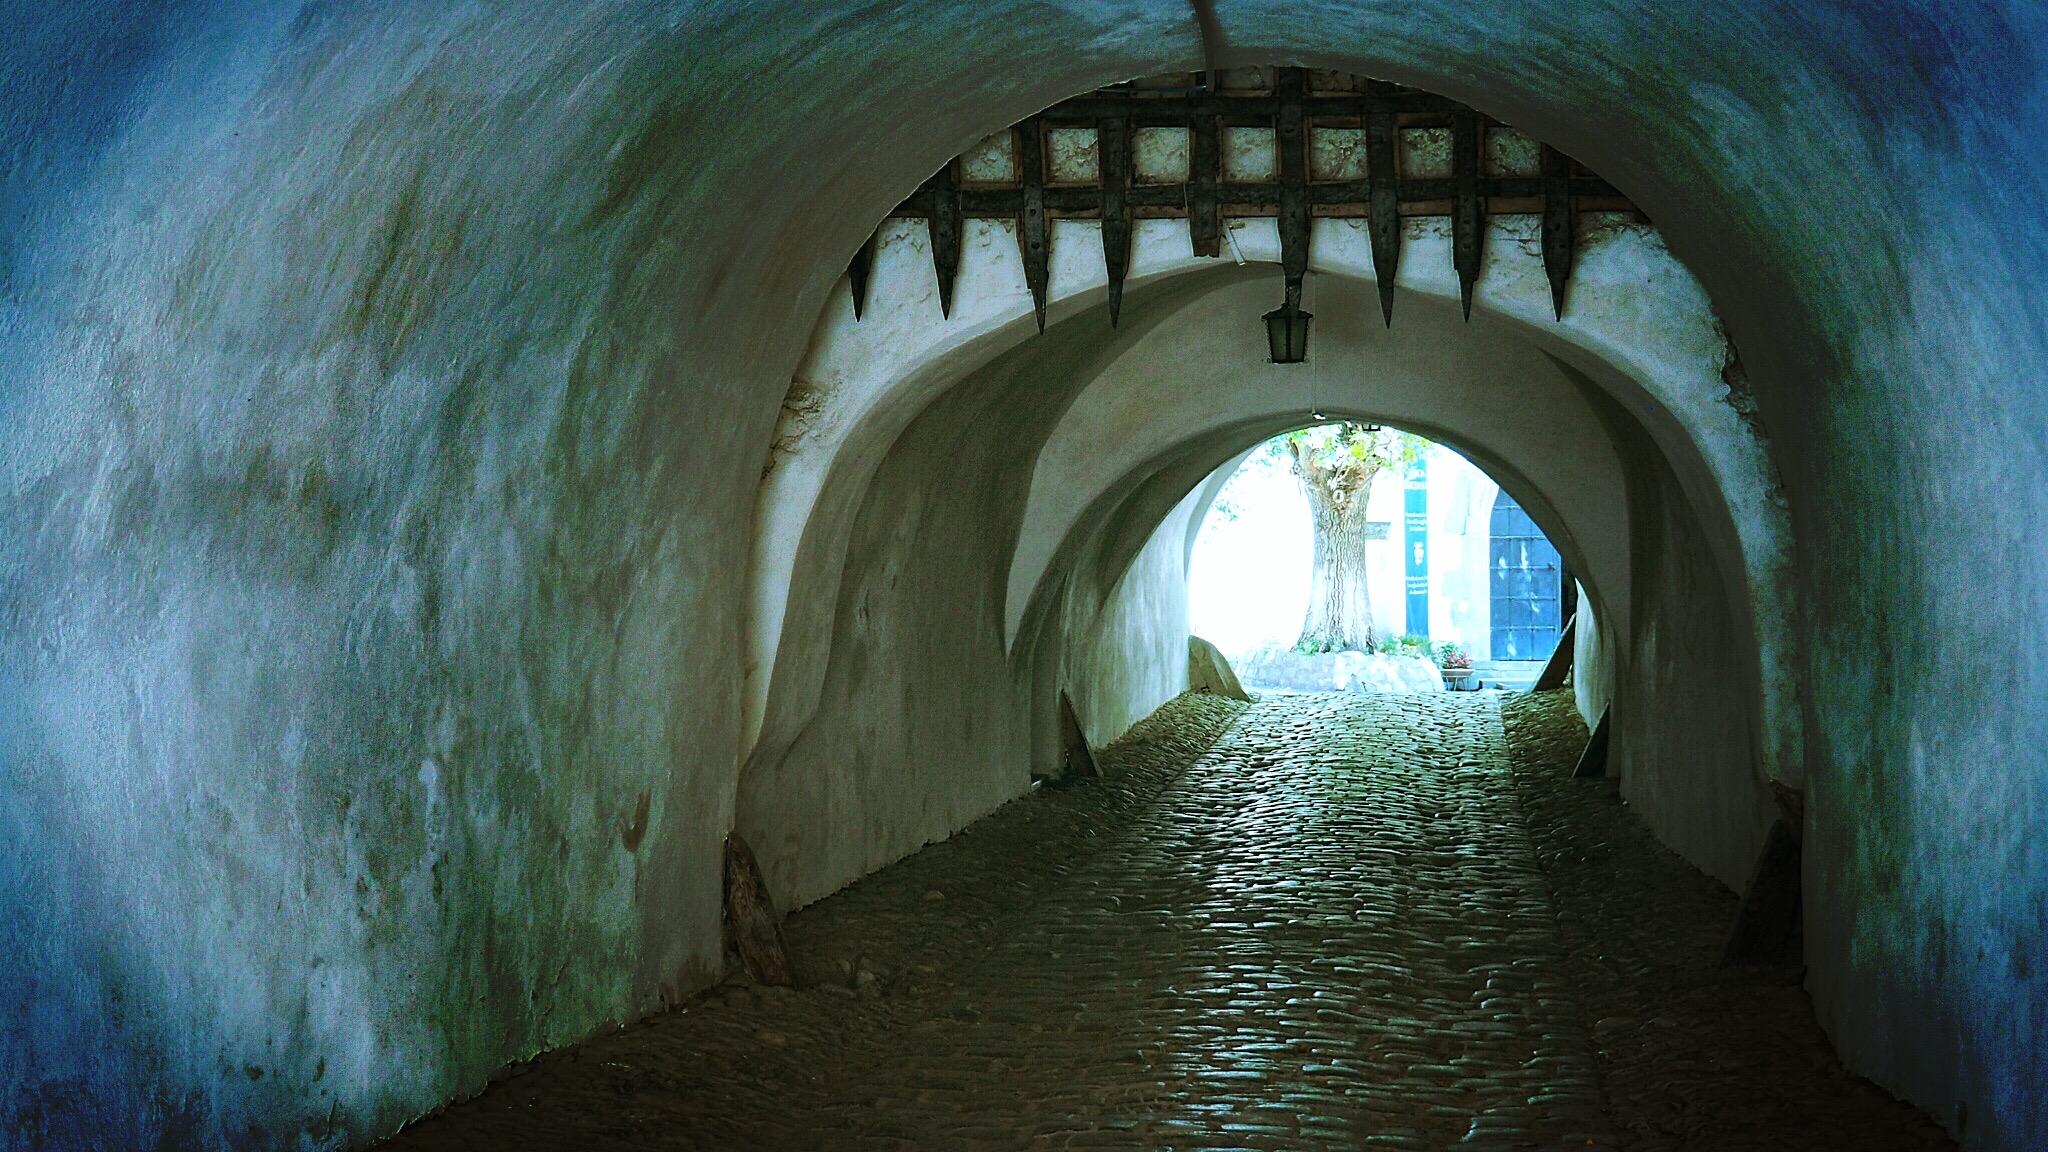 Eingang zur Kirchenburg Prejmer (Tartlau)